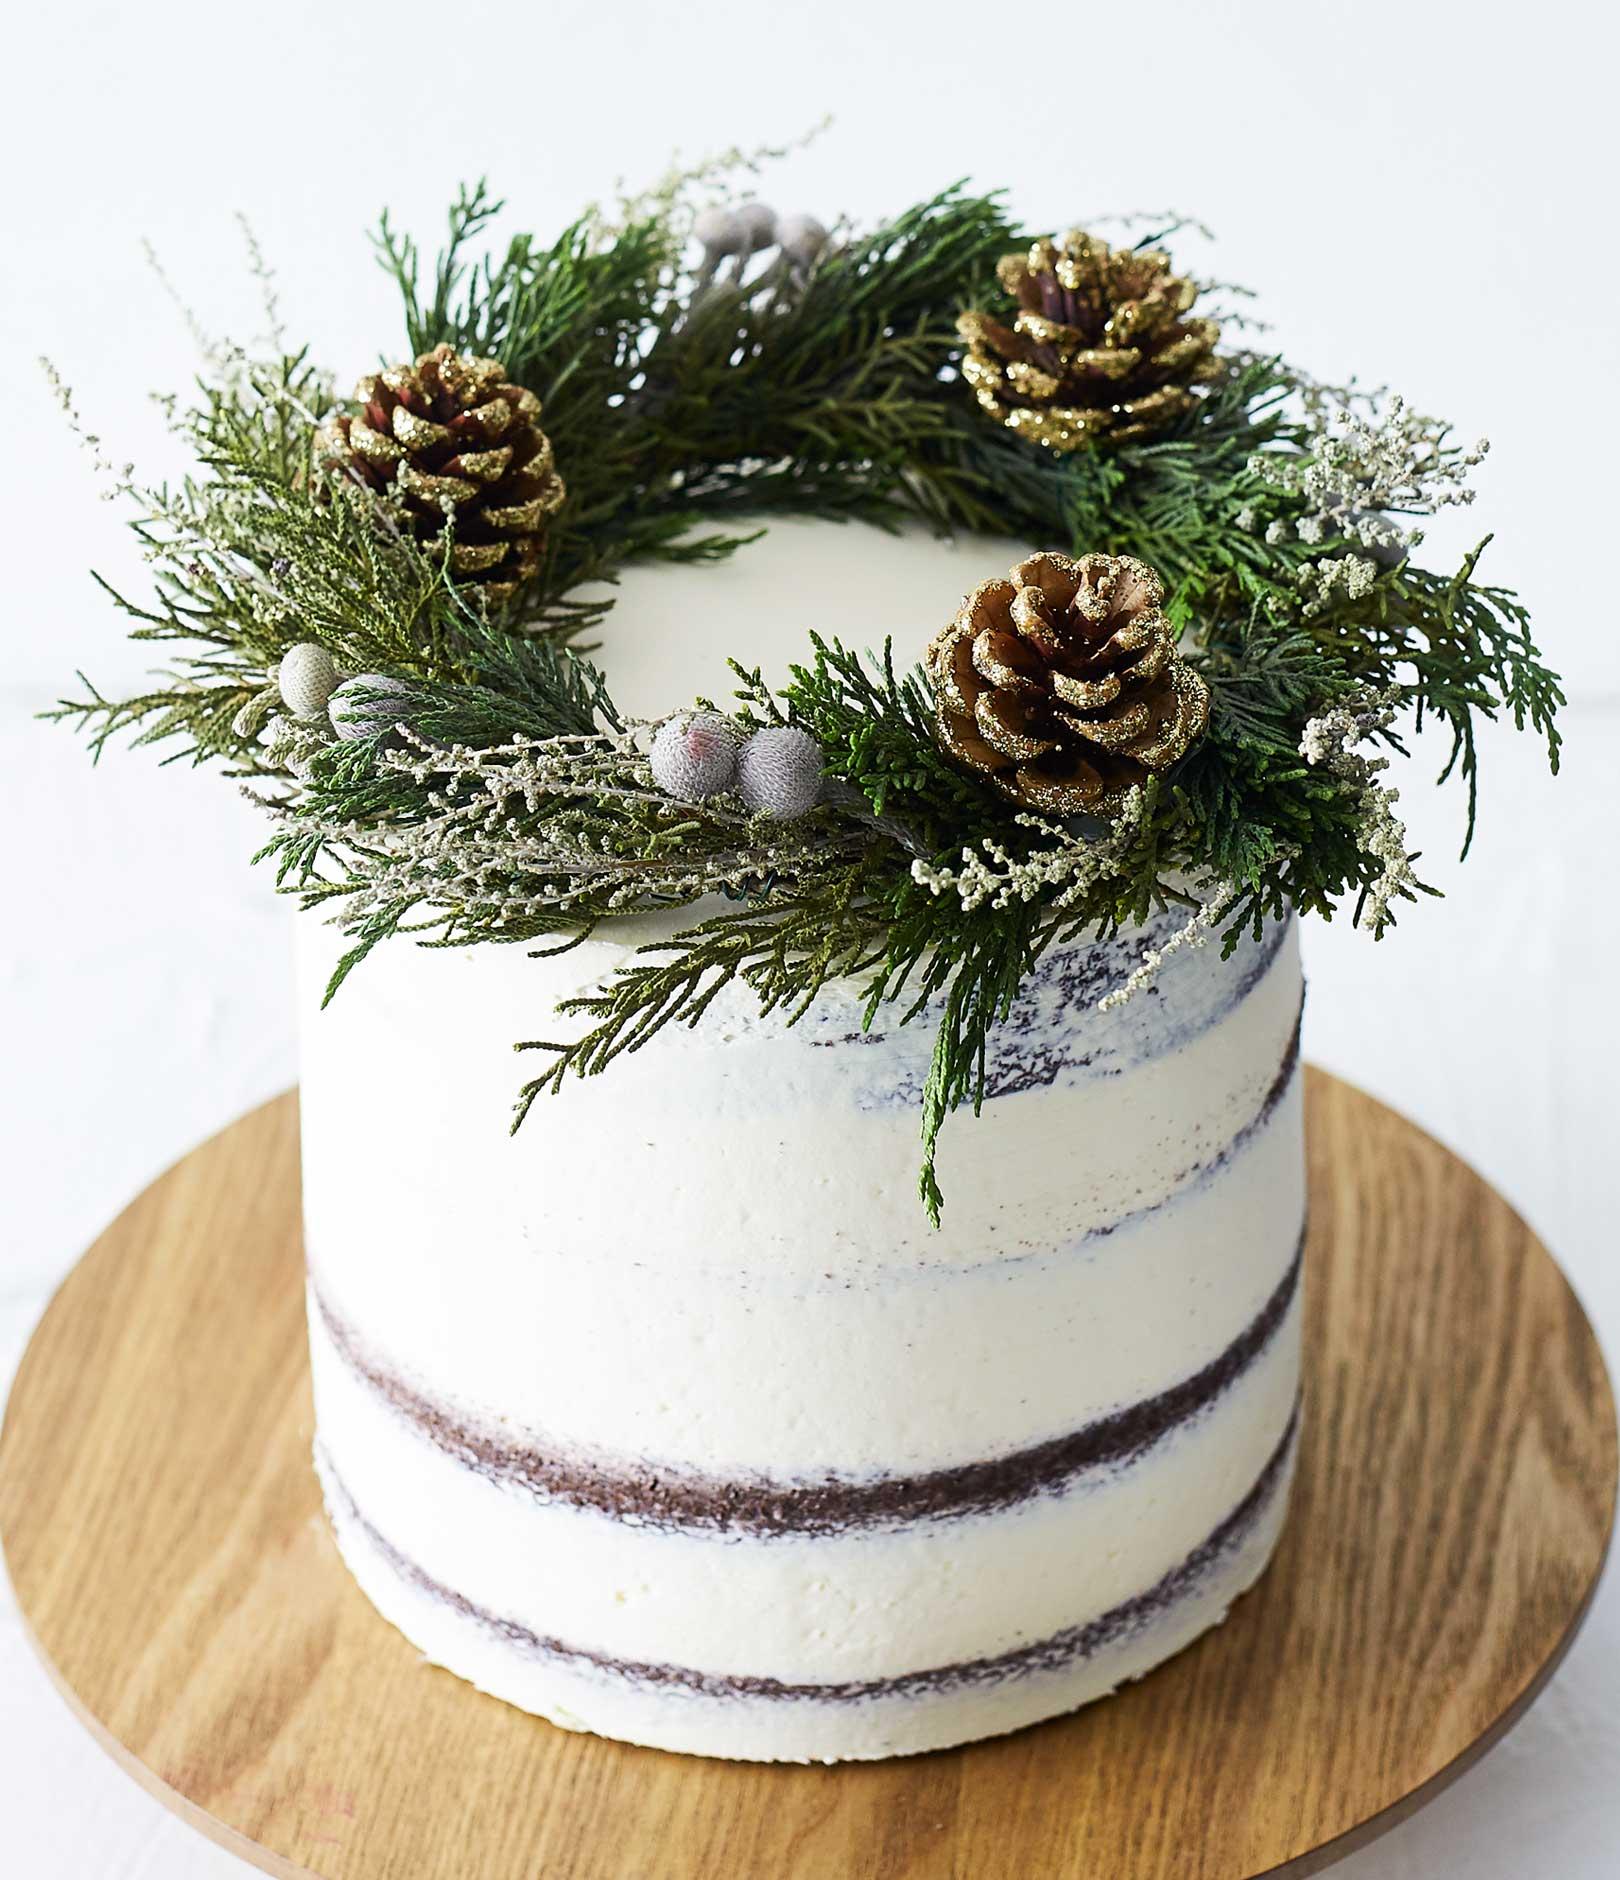 Best Christmas Dessert - Chocolate Mint Rustic Cake Online - Cape Town - The Velvet Cake Co (2)